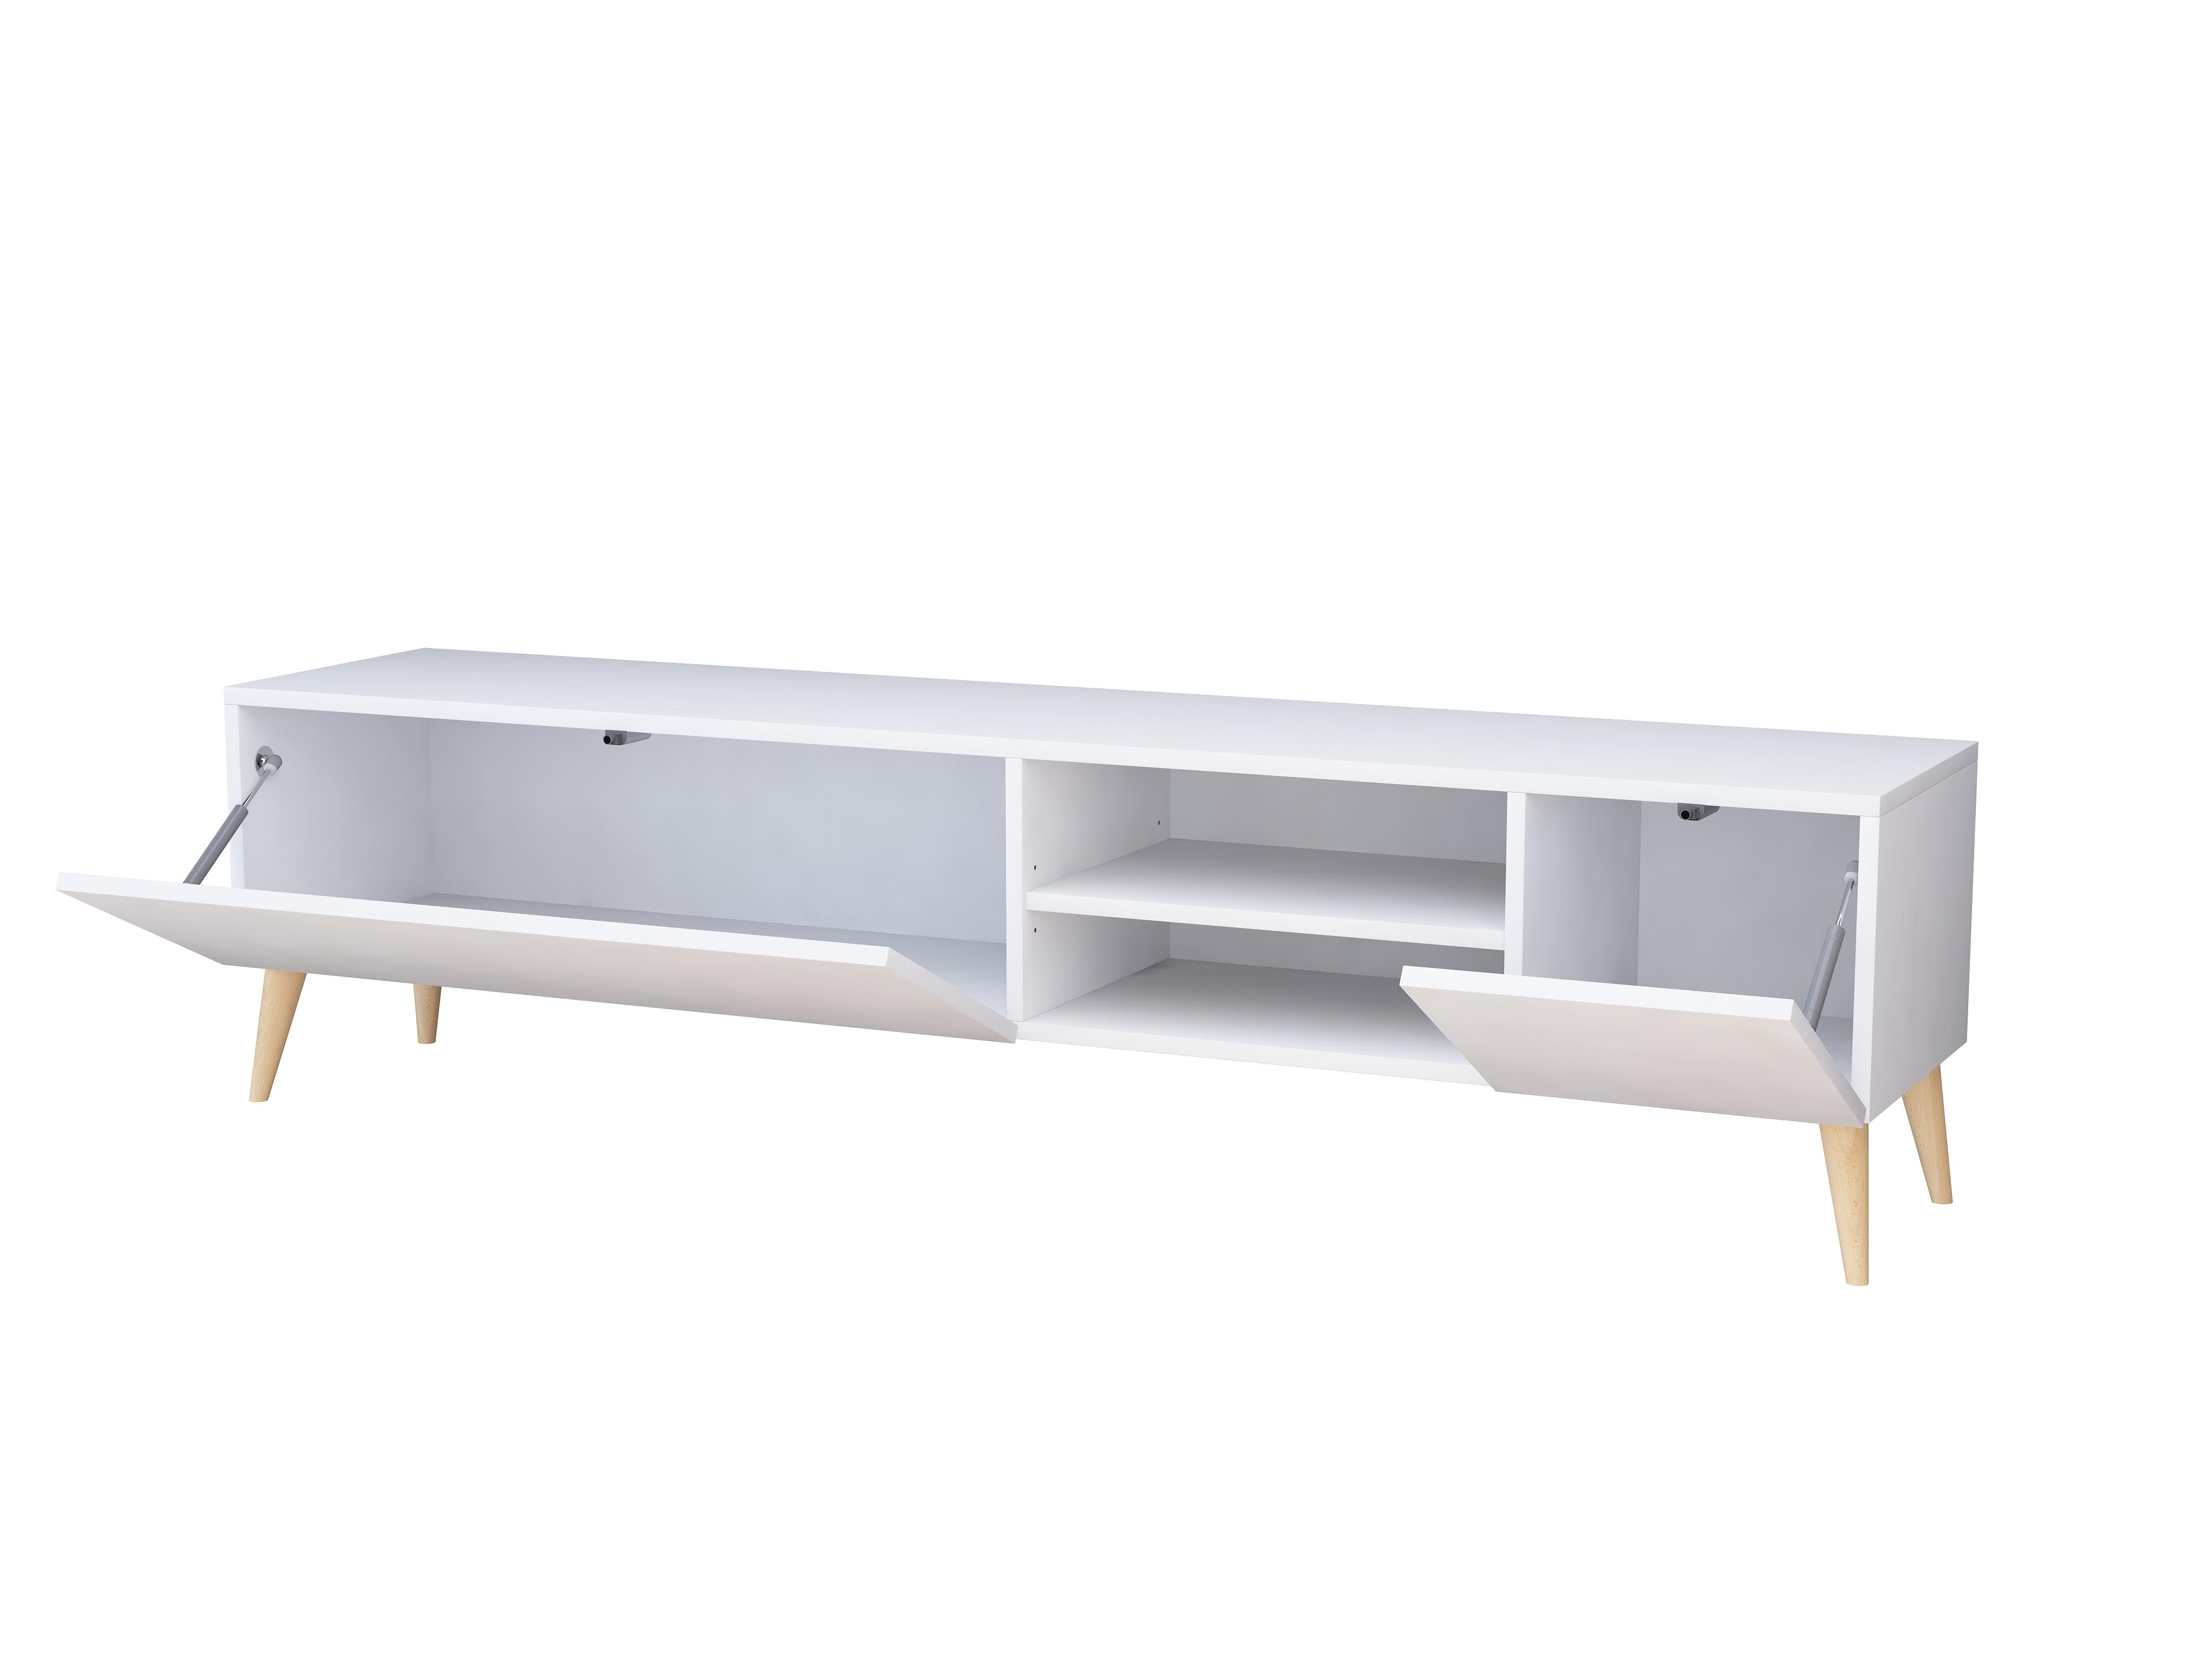 Szafka rtv Scandi Galicja2, 180cm, biały mat.